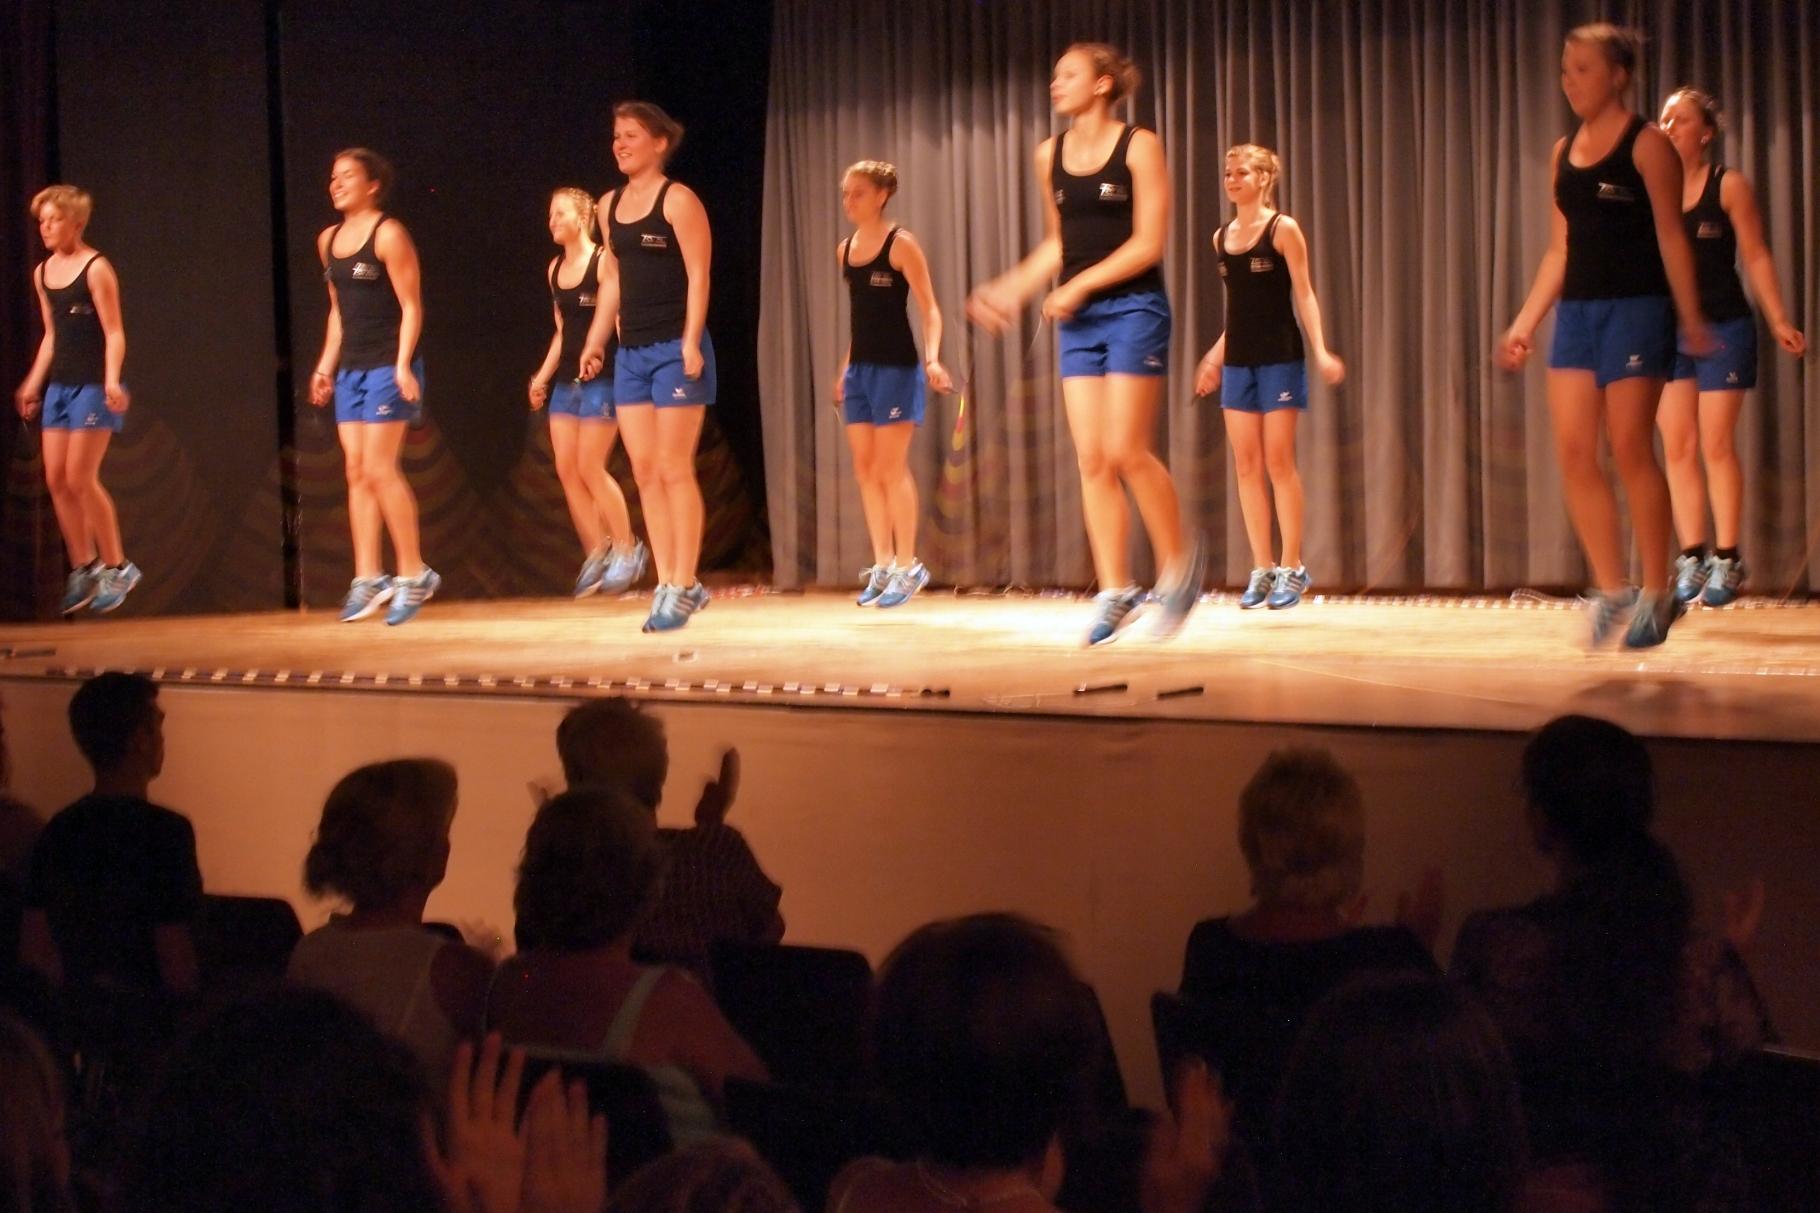 change in - Abschlussfest Barbarasaal Stetten-Institut - Foto: Robert Hösle - Freiwilligen-Zentrum Augsburg